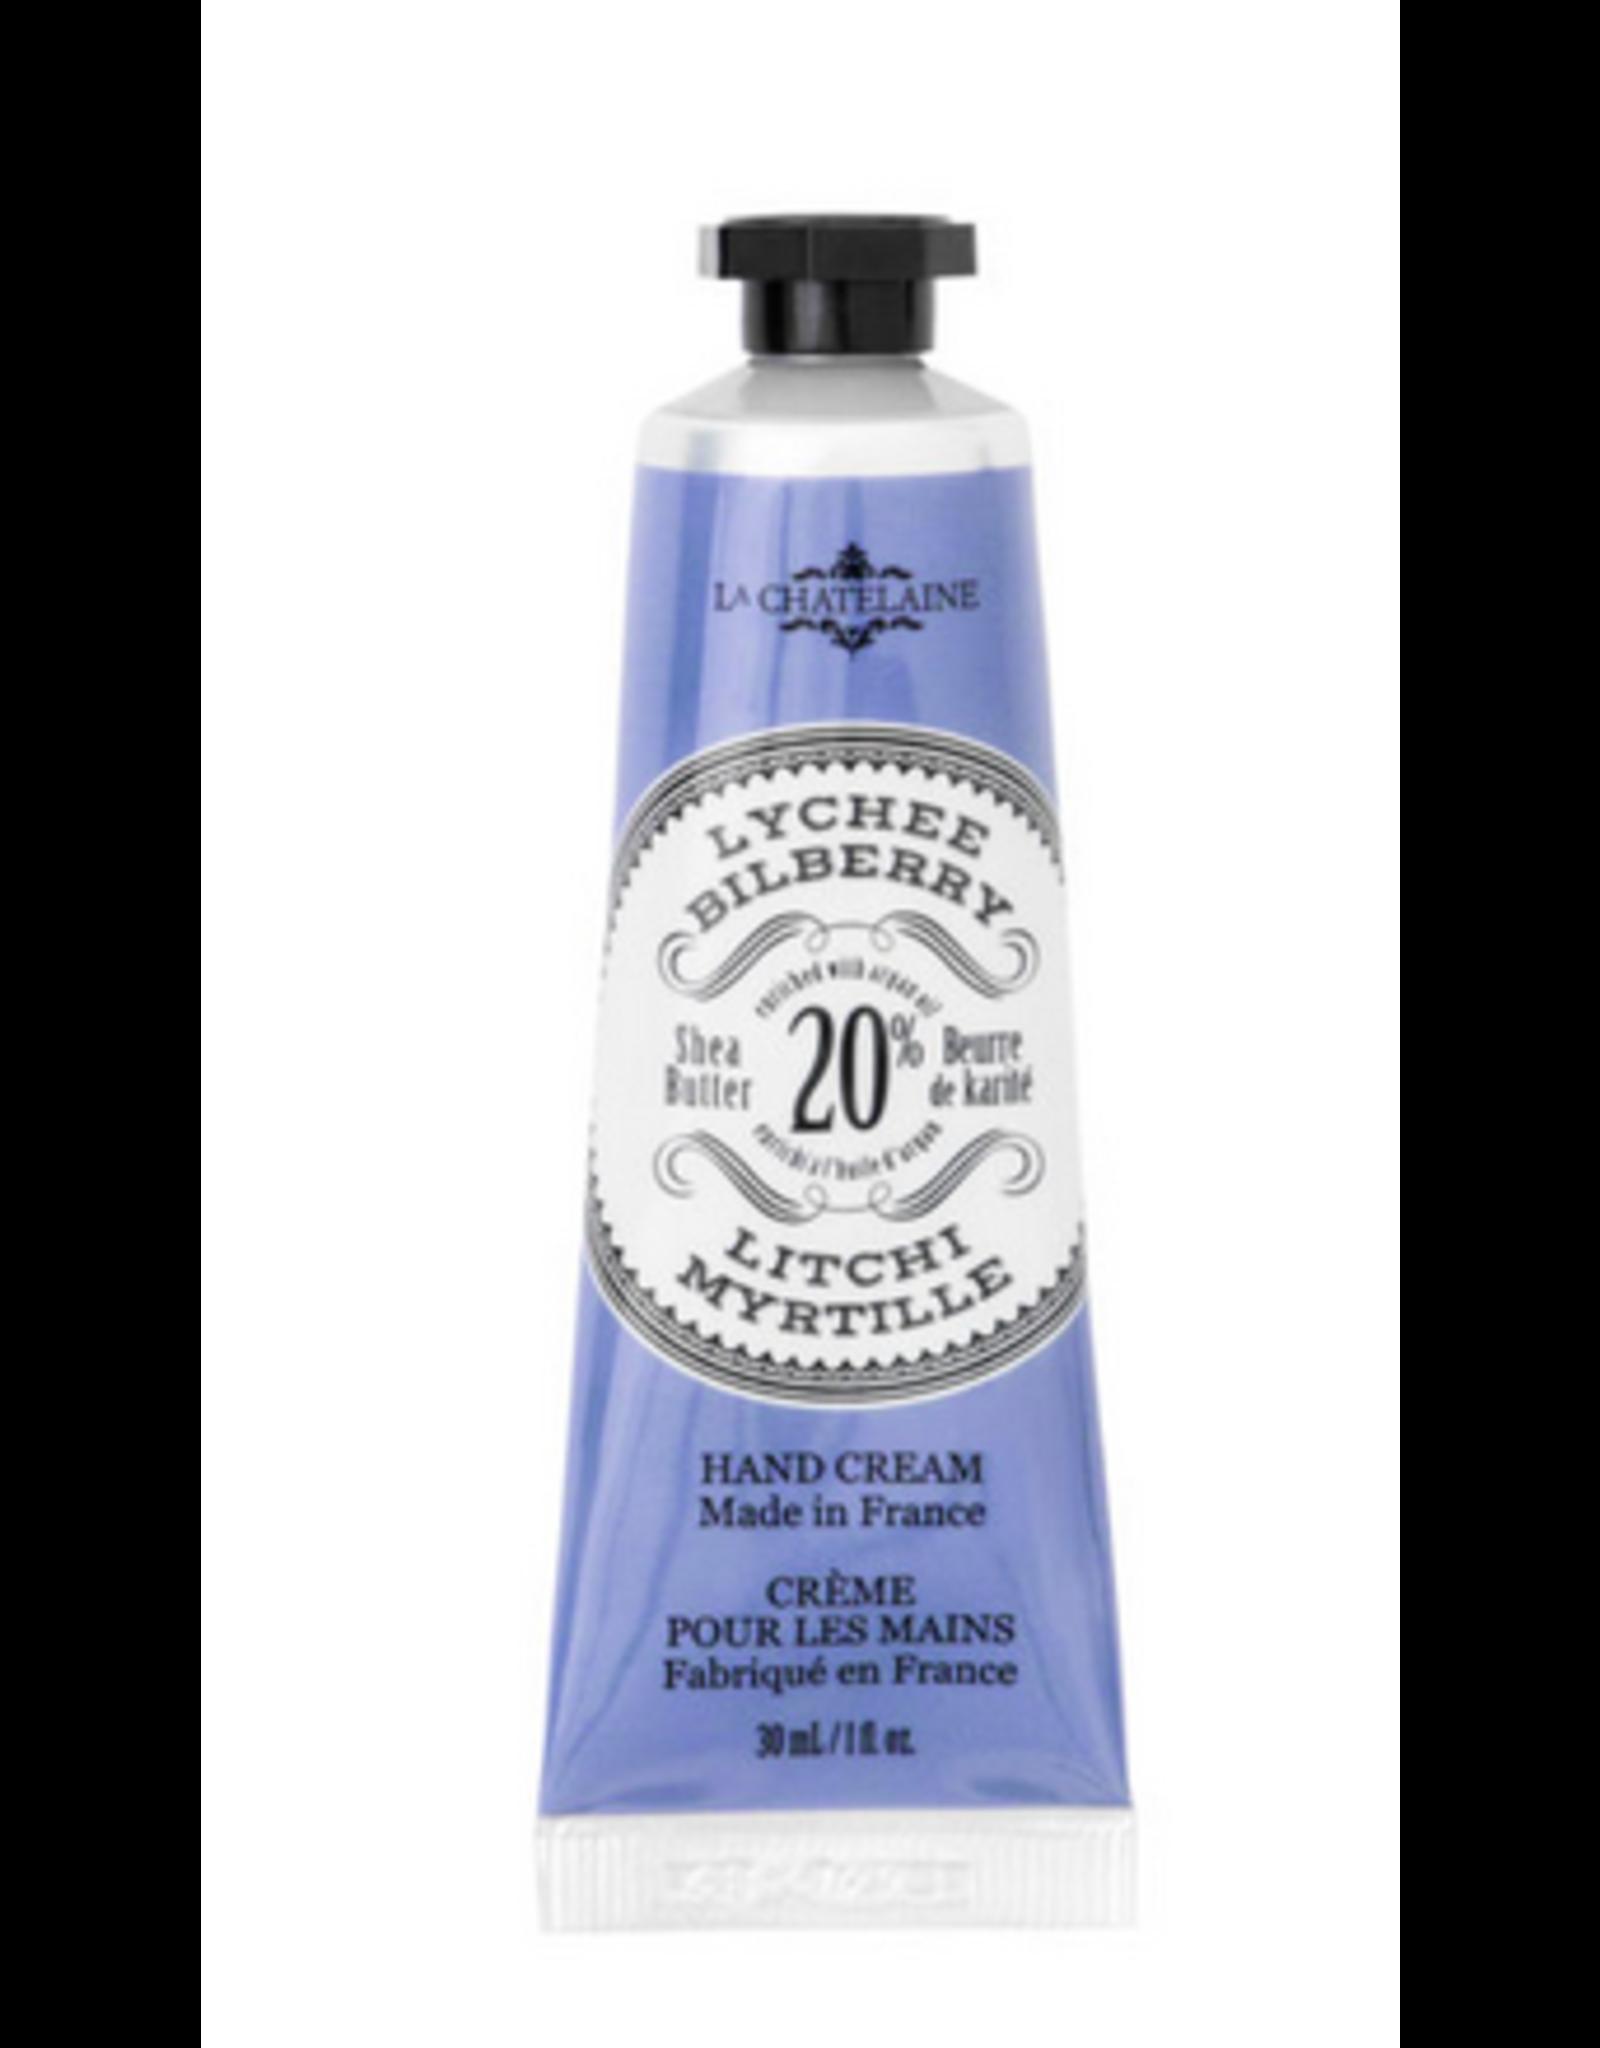 La Chatelaine Lychee Bilberry Hand Cream